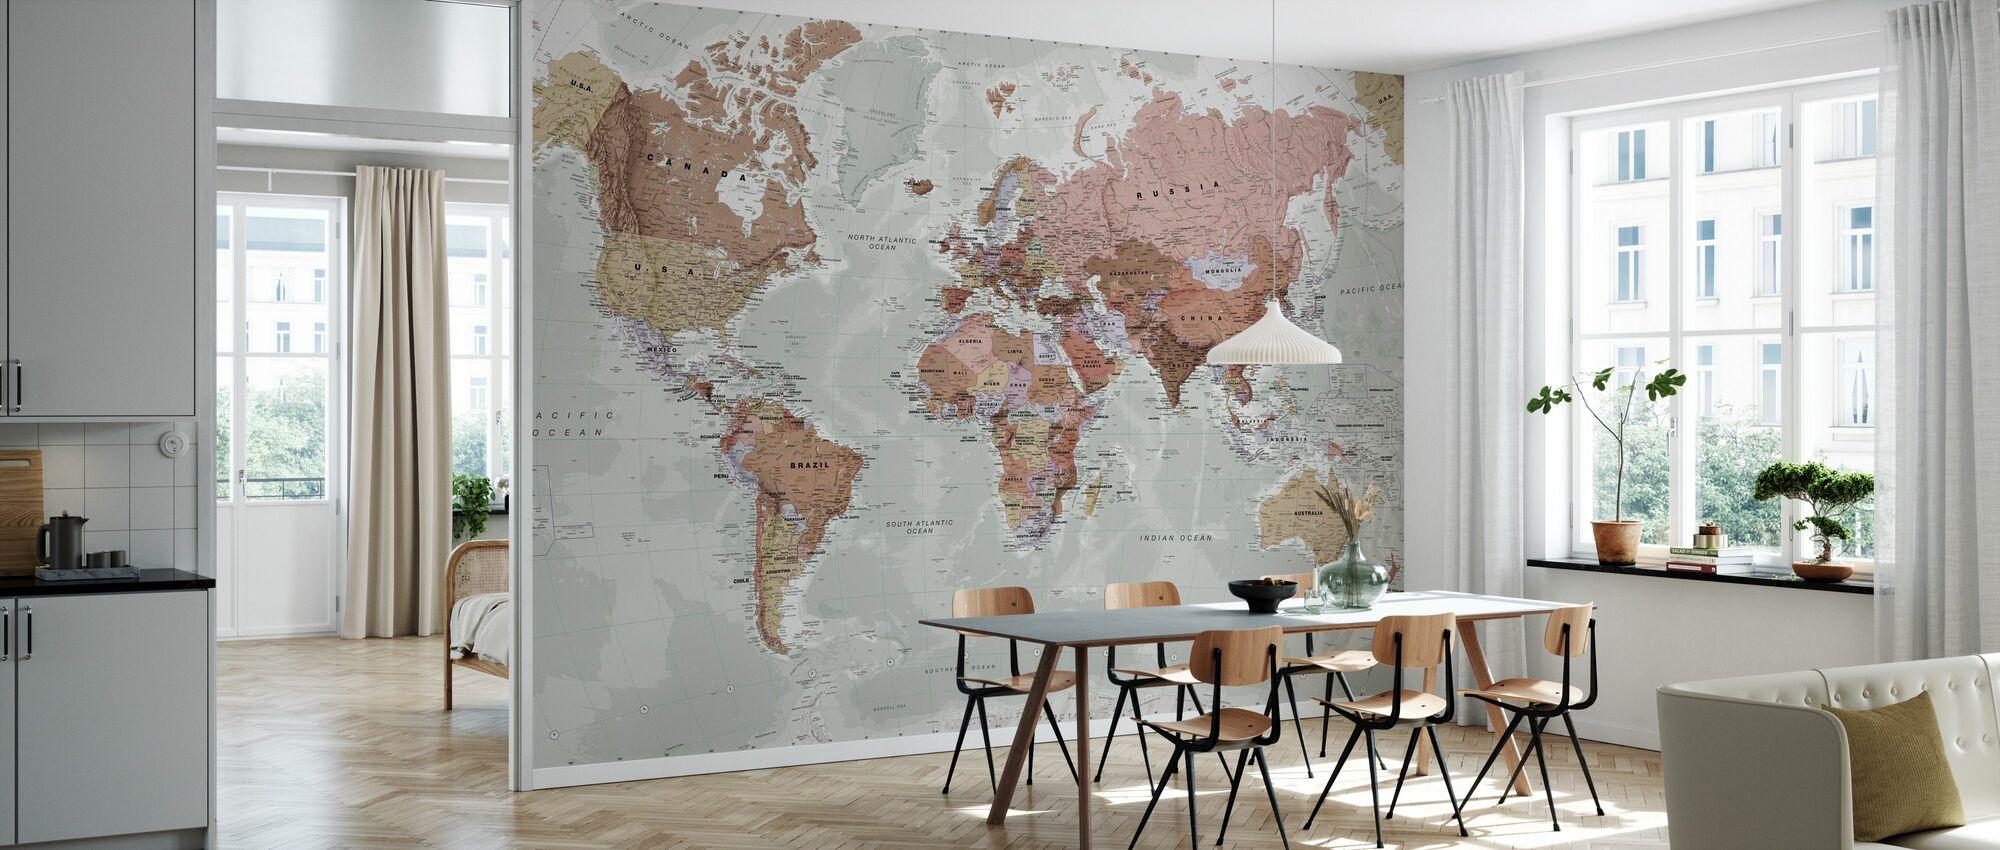 Executive Political World Map - Wallpaper - Kitchen